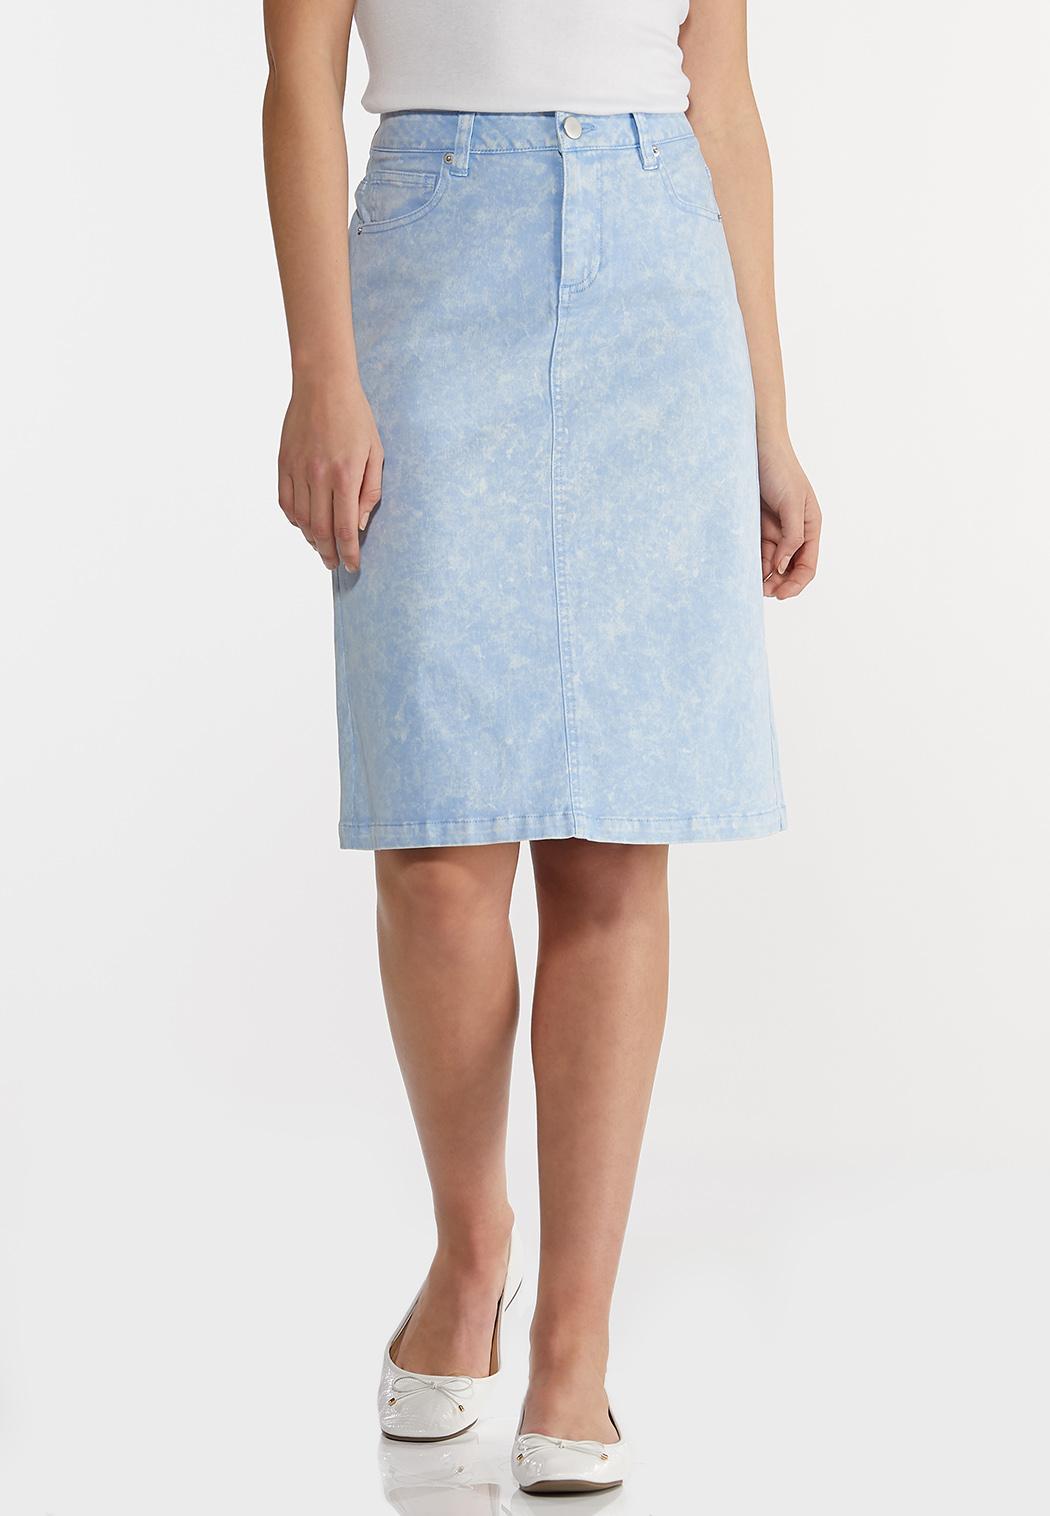 Plus Size Sky Blue Denim Skirt